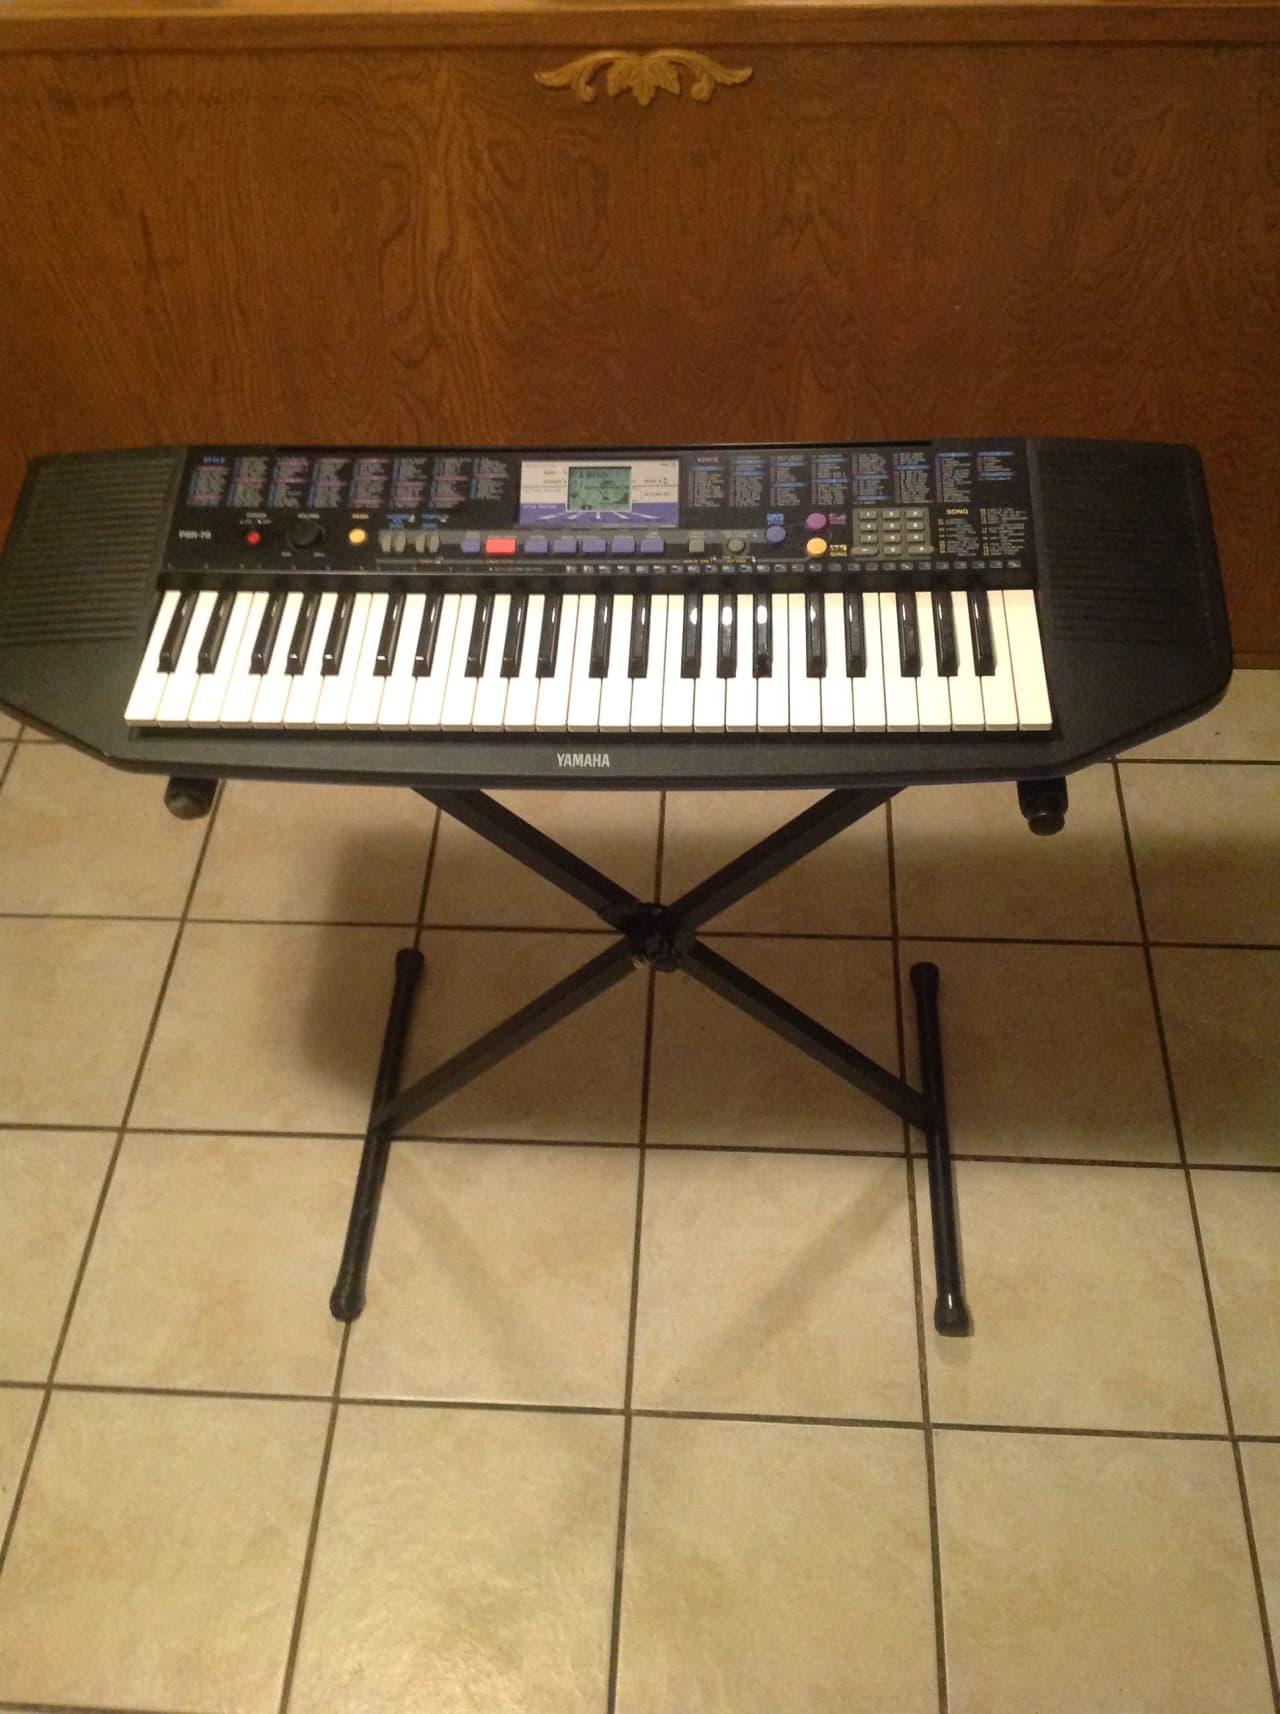 Yamaha psr 78 keyboard w stand black blue reverb for Yamaha psr stand